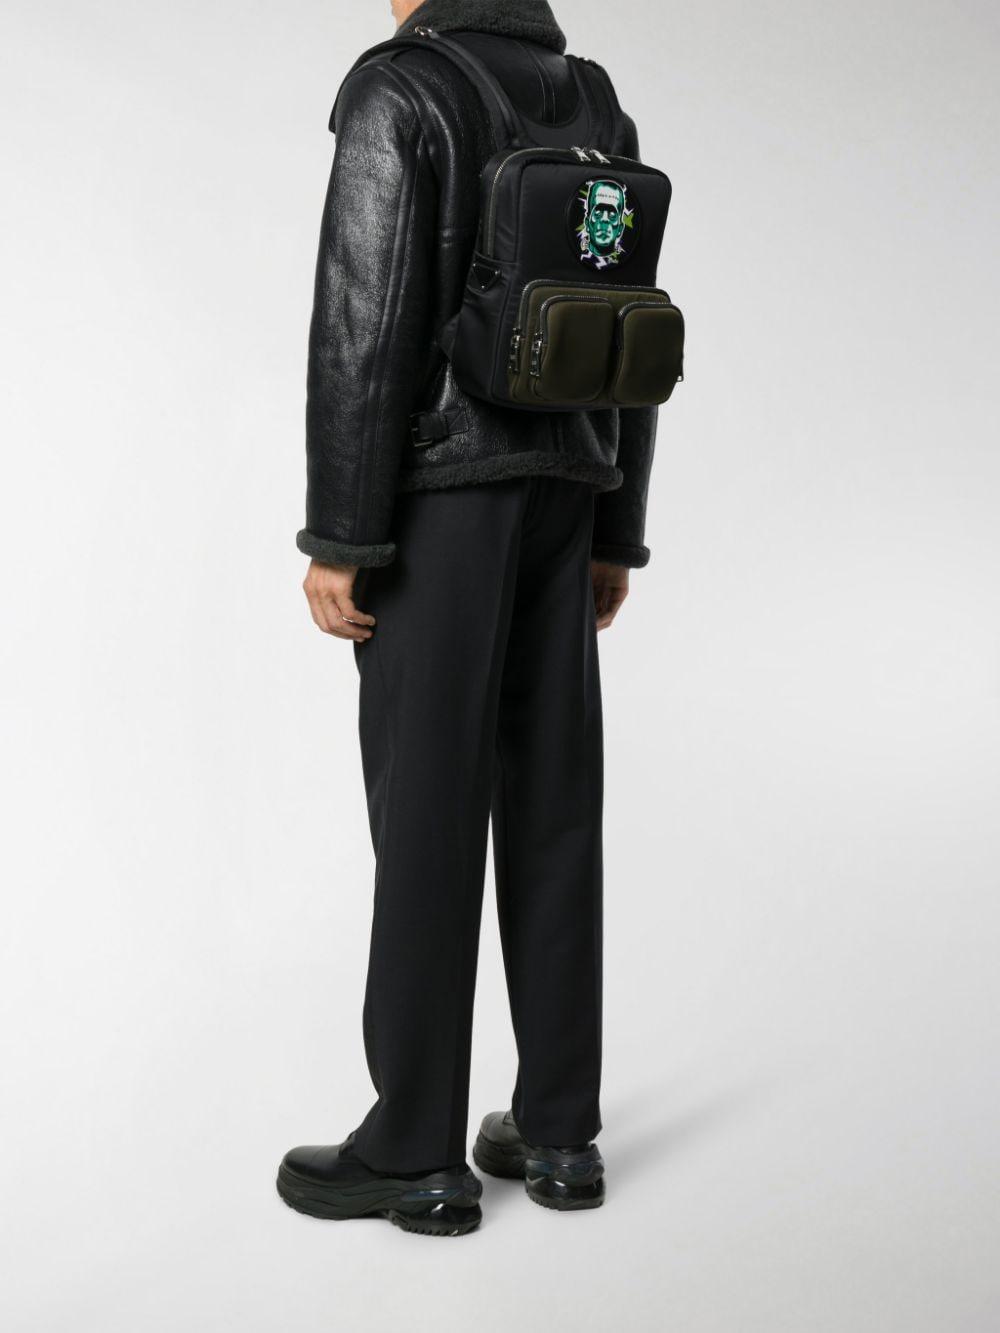 Jacket! Sew On Vest Backpack Printed Patch Bag THE ARMOURER